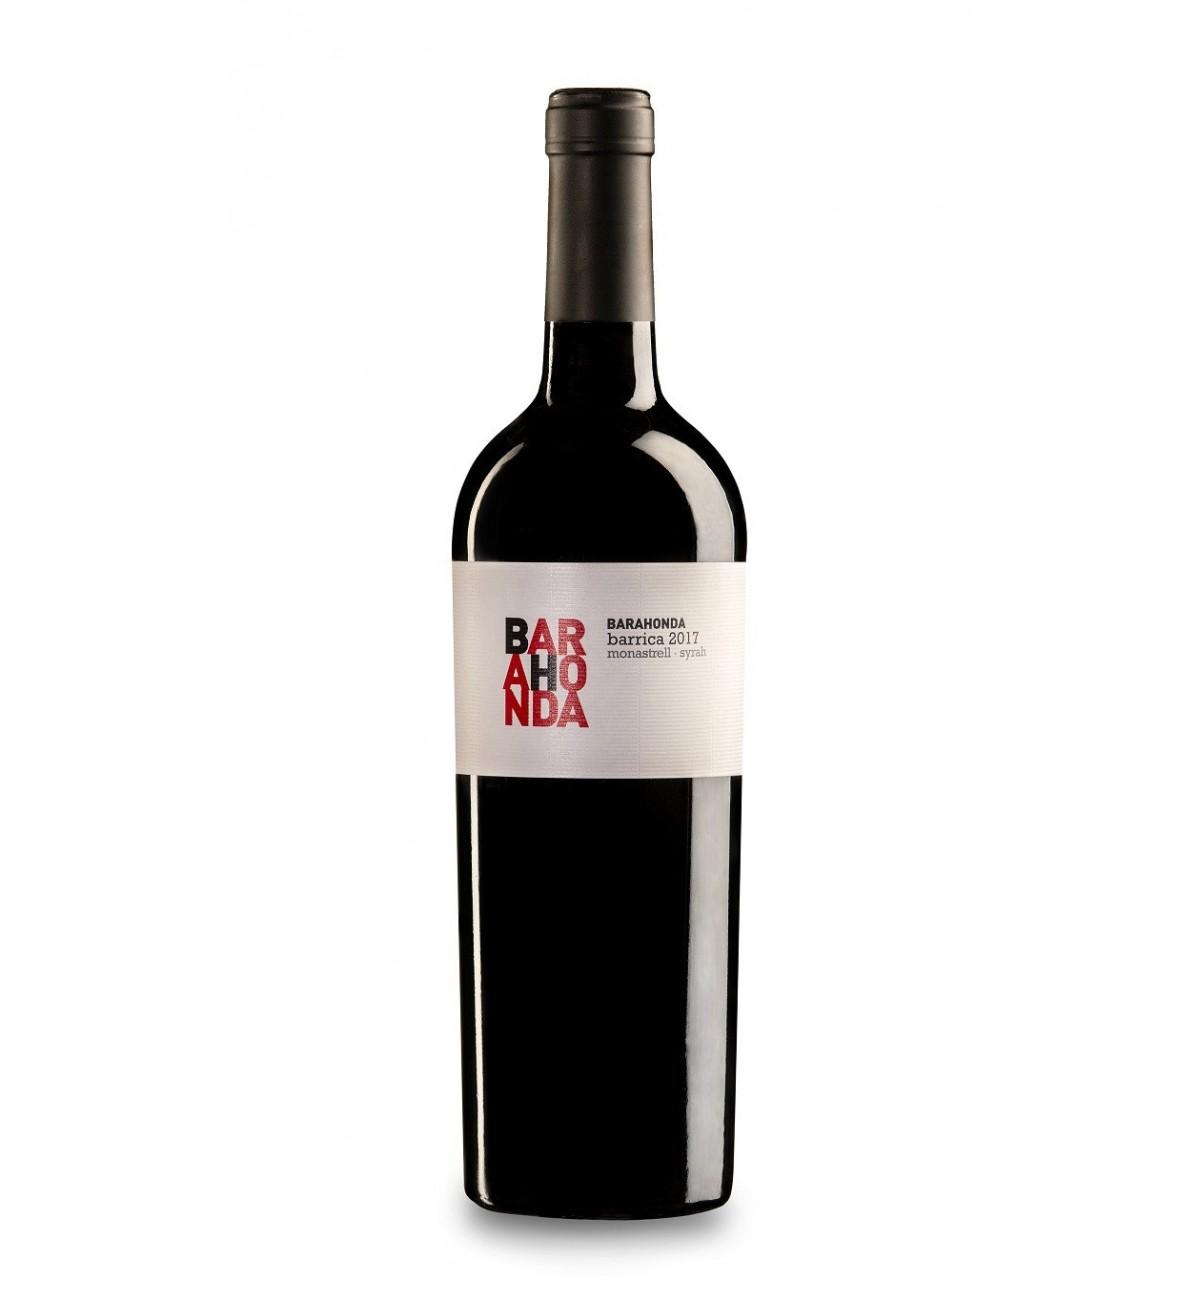 Barahonda Barrica 2017 * Monastrell, Syrah, Yecla, Vino tinto